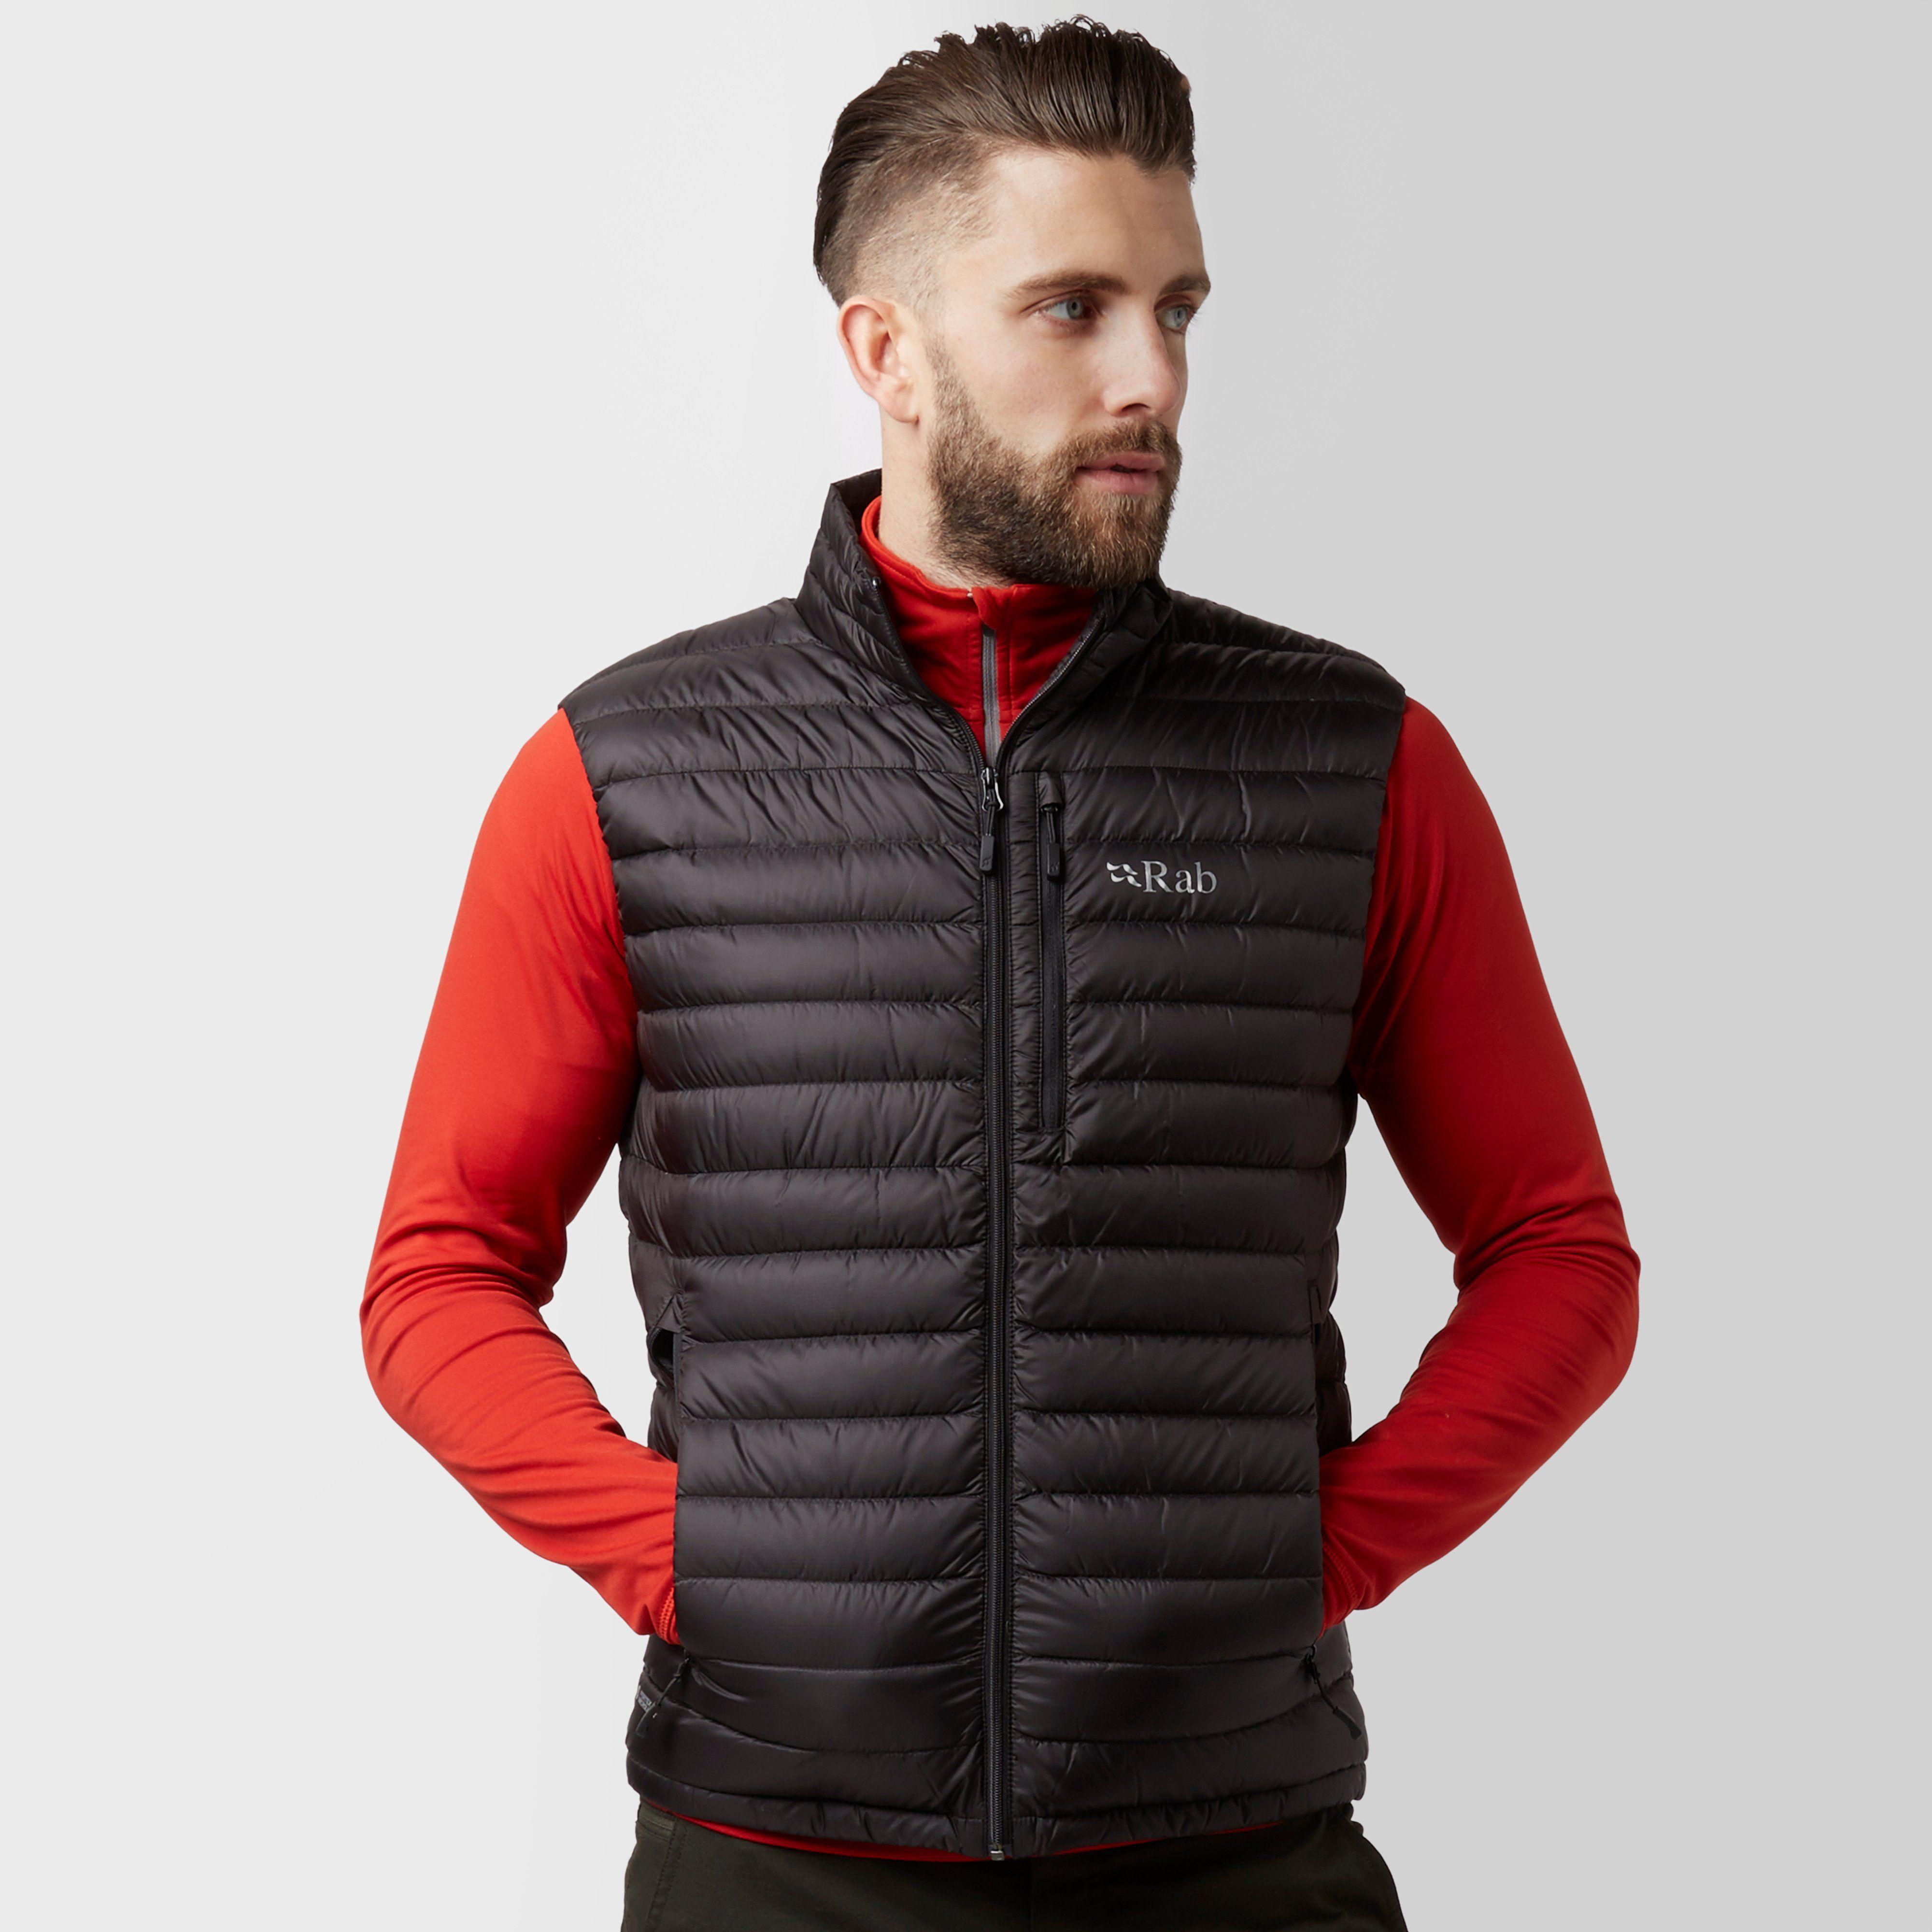 RAB Men's Microlight Vest